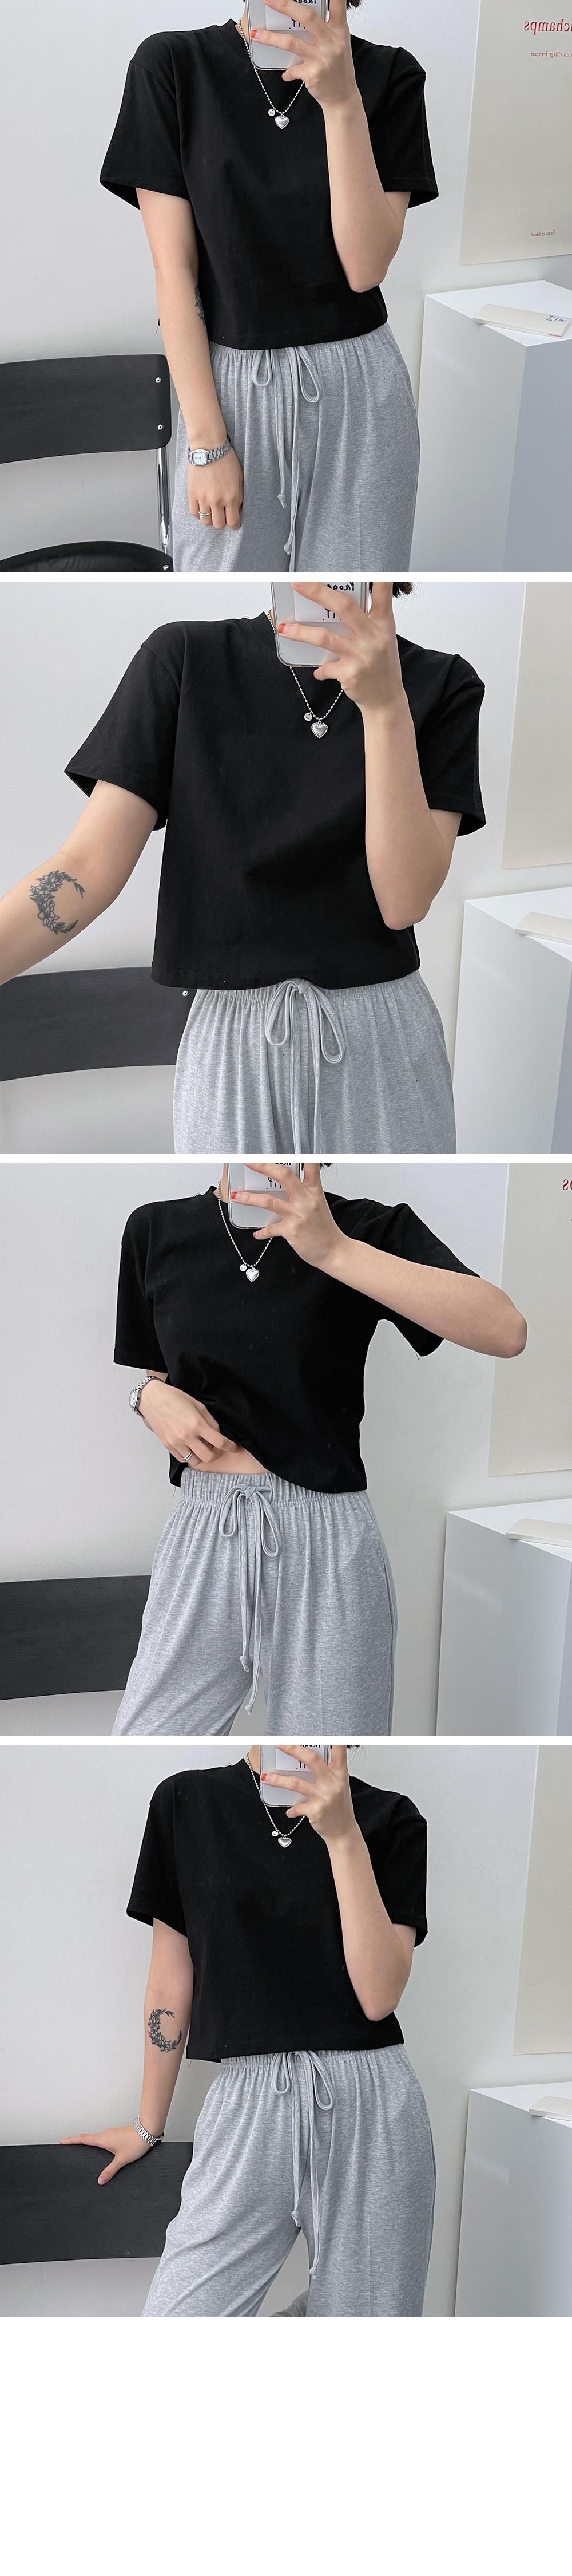 dress product image-S1L27